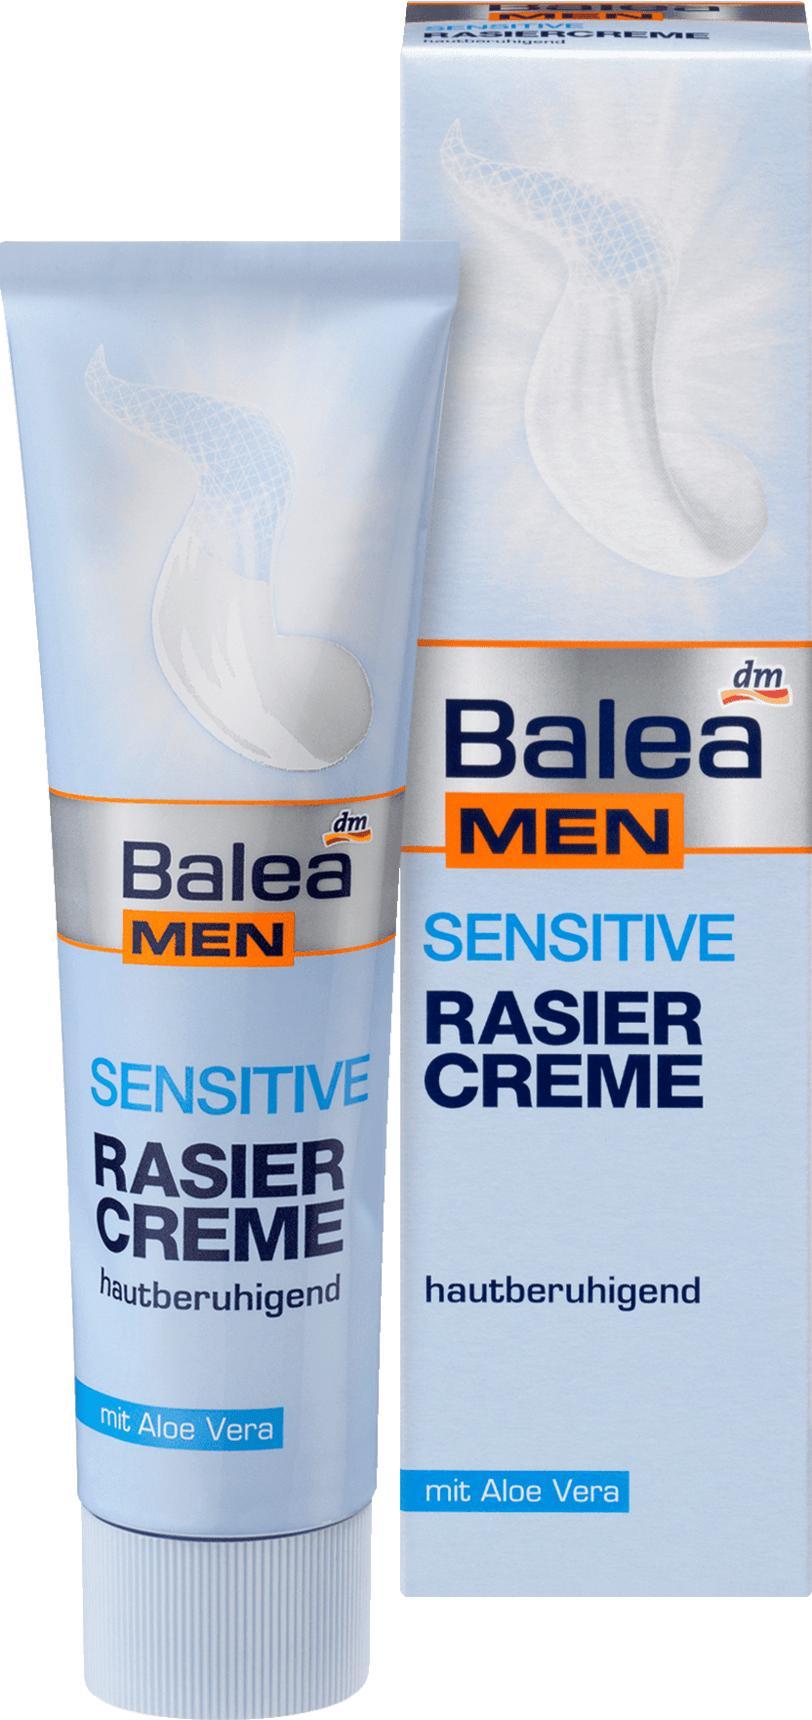 Kem Cạo Râu BALEA MEN Sensitive RASIER CREME 100ML tốt nhất